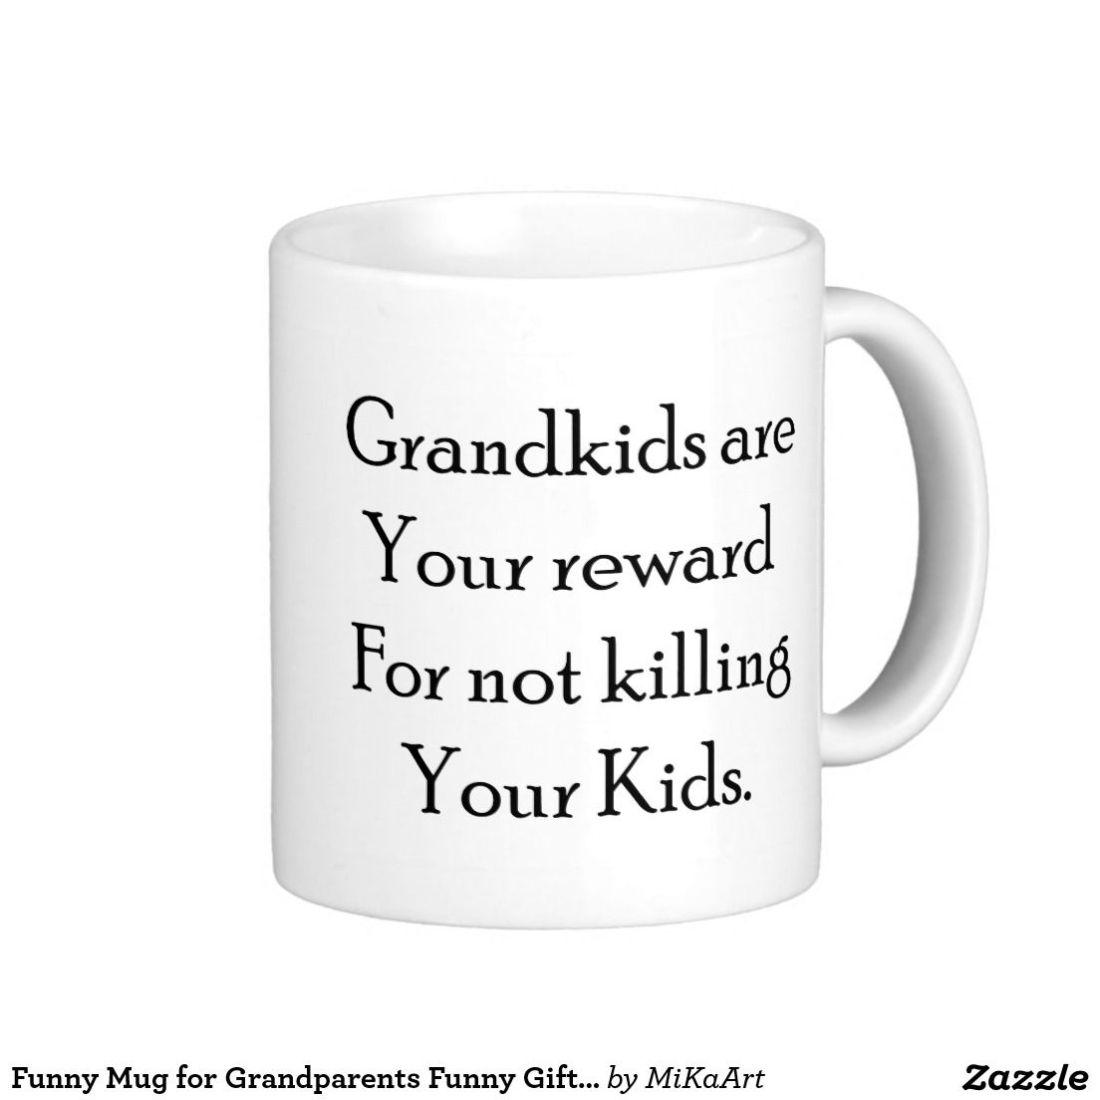 Funny mug for grandparents funny gift for grandma funny